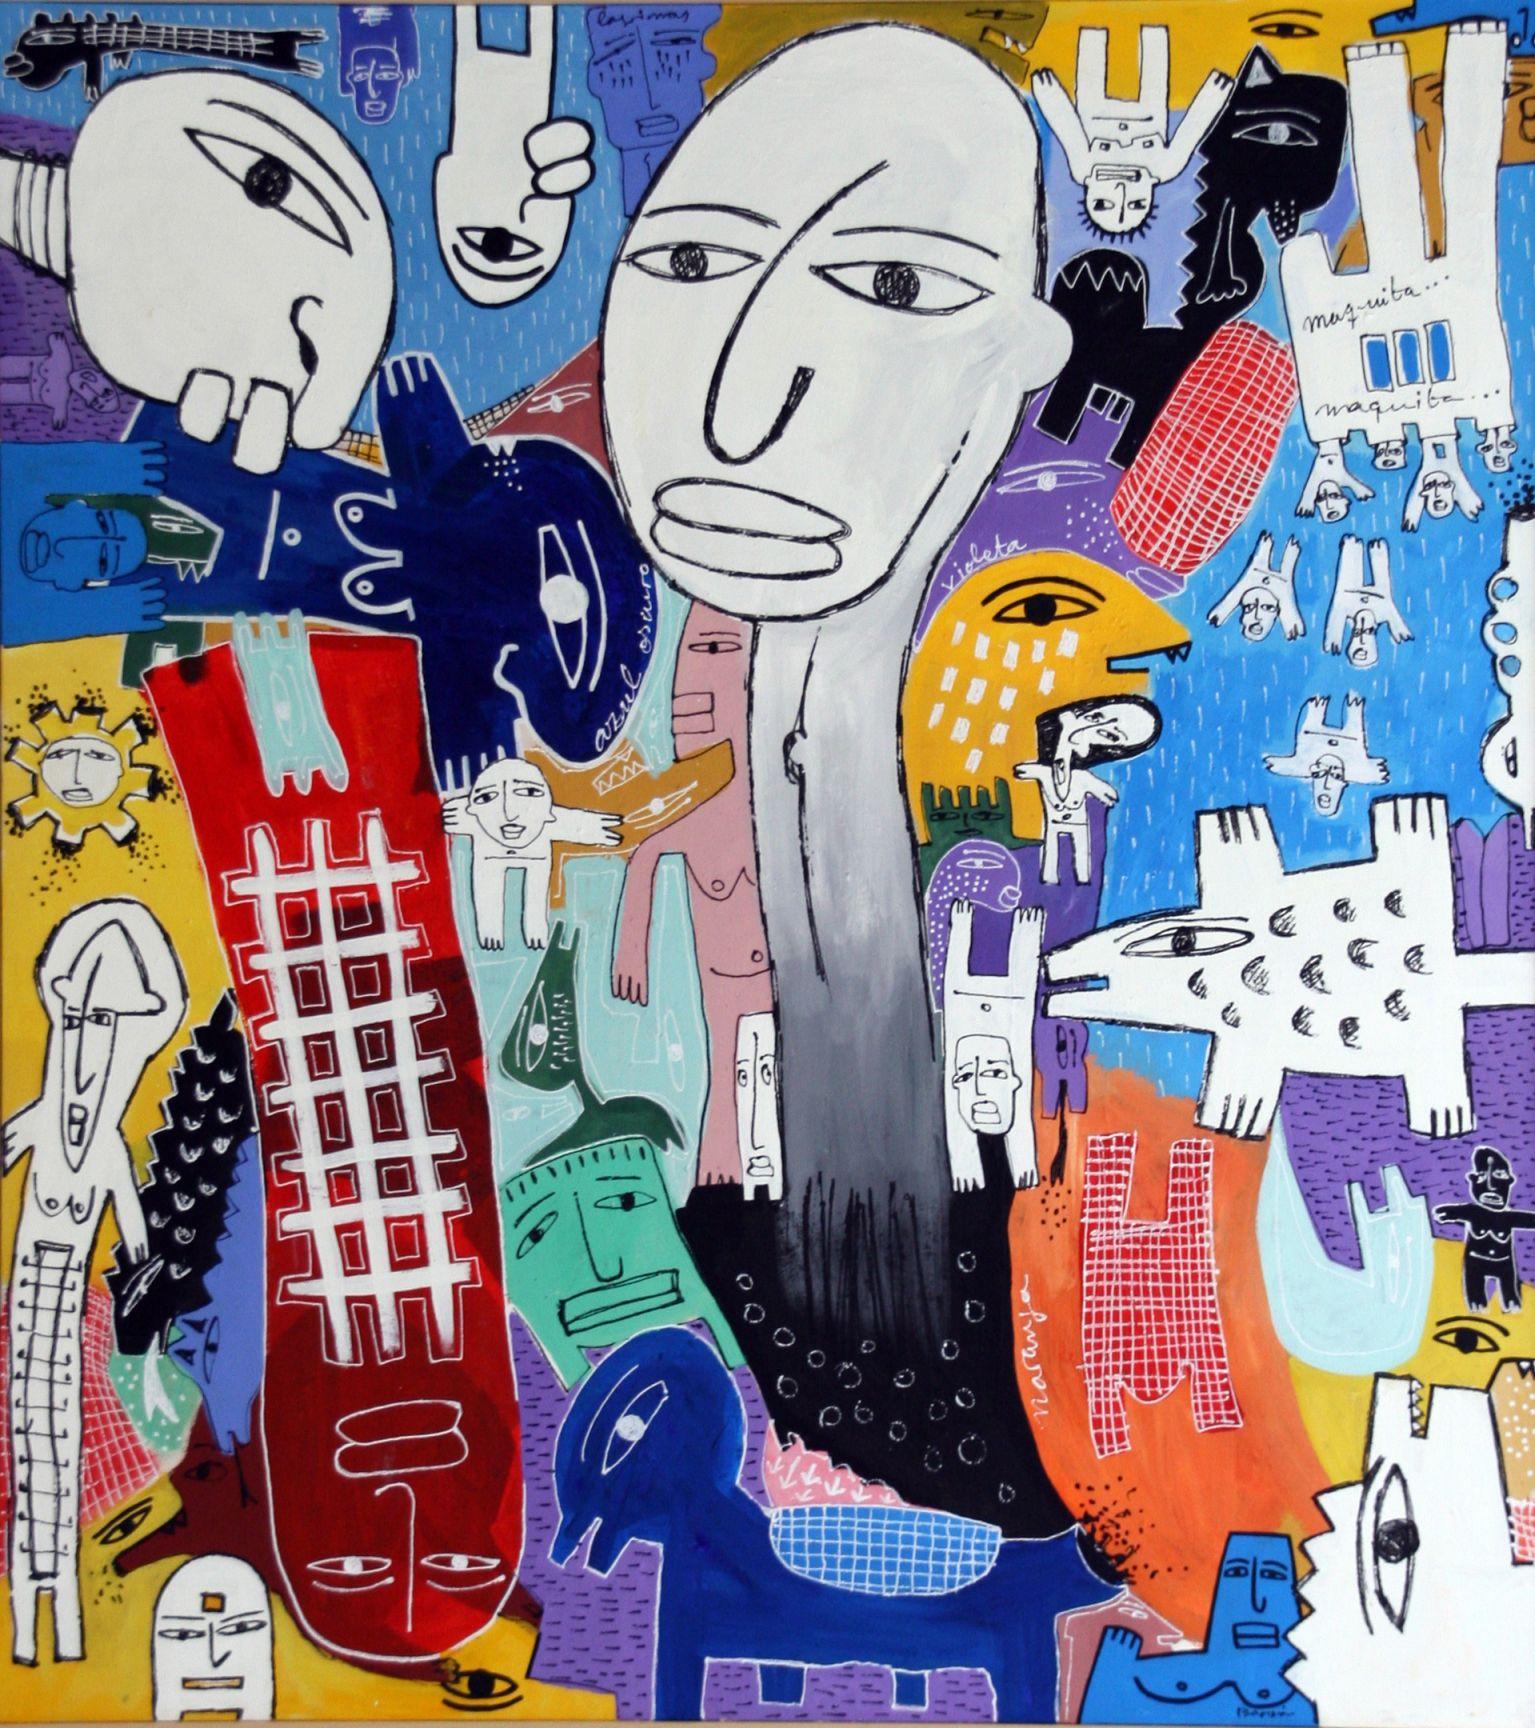 Imagina picture (2015) - Joaquín Barón